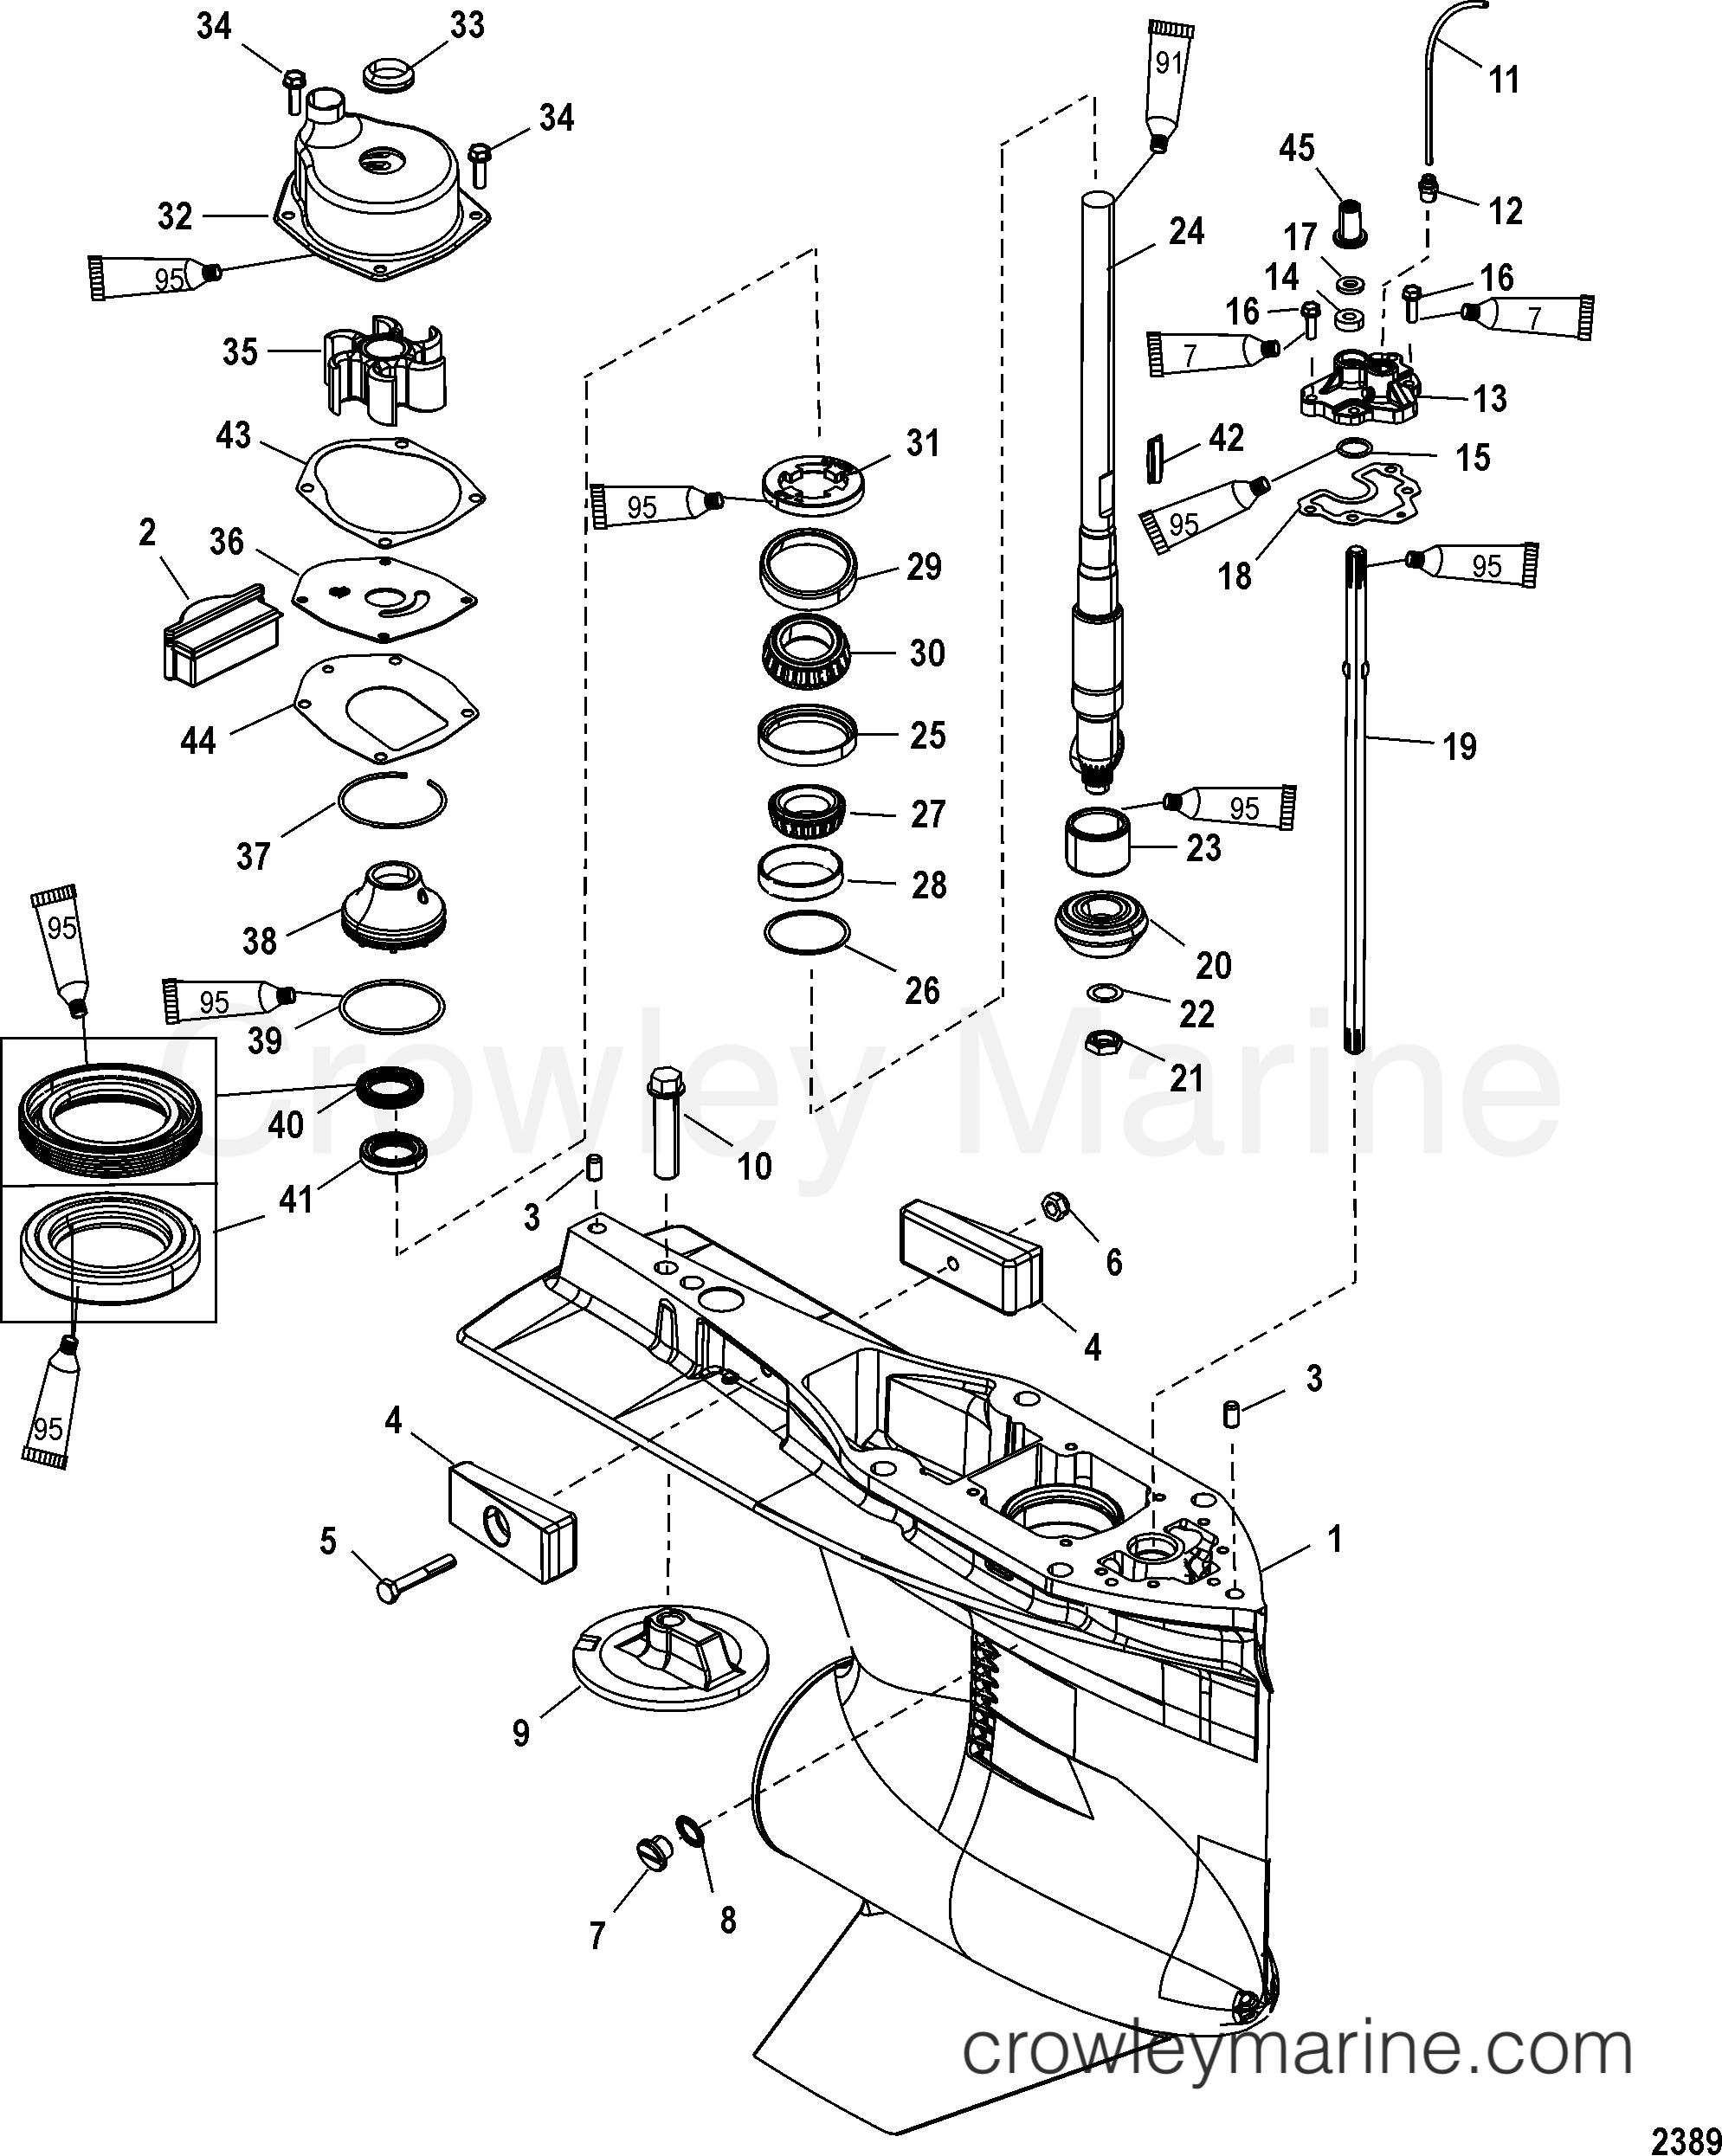 Serial Range Mariner Outboard 250 VERADO (4-STROKE)(6 CYL.) - 0P409357 THRU 0P464487 [BEL] GEAR HOUSING(DRIVESHAFT)(STANDARD/COUNTER ROTATION) section